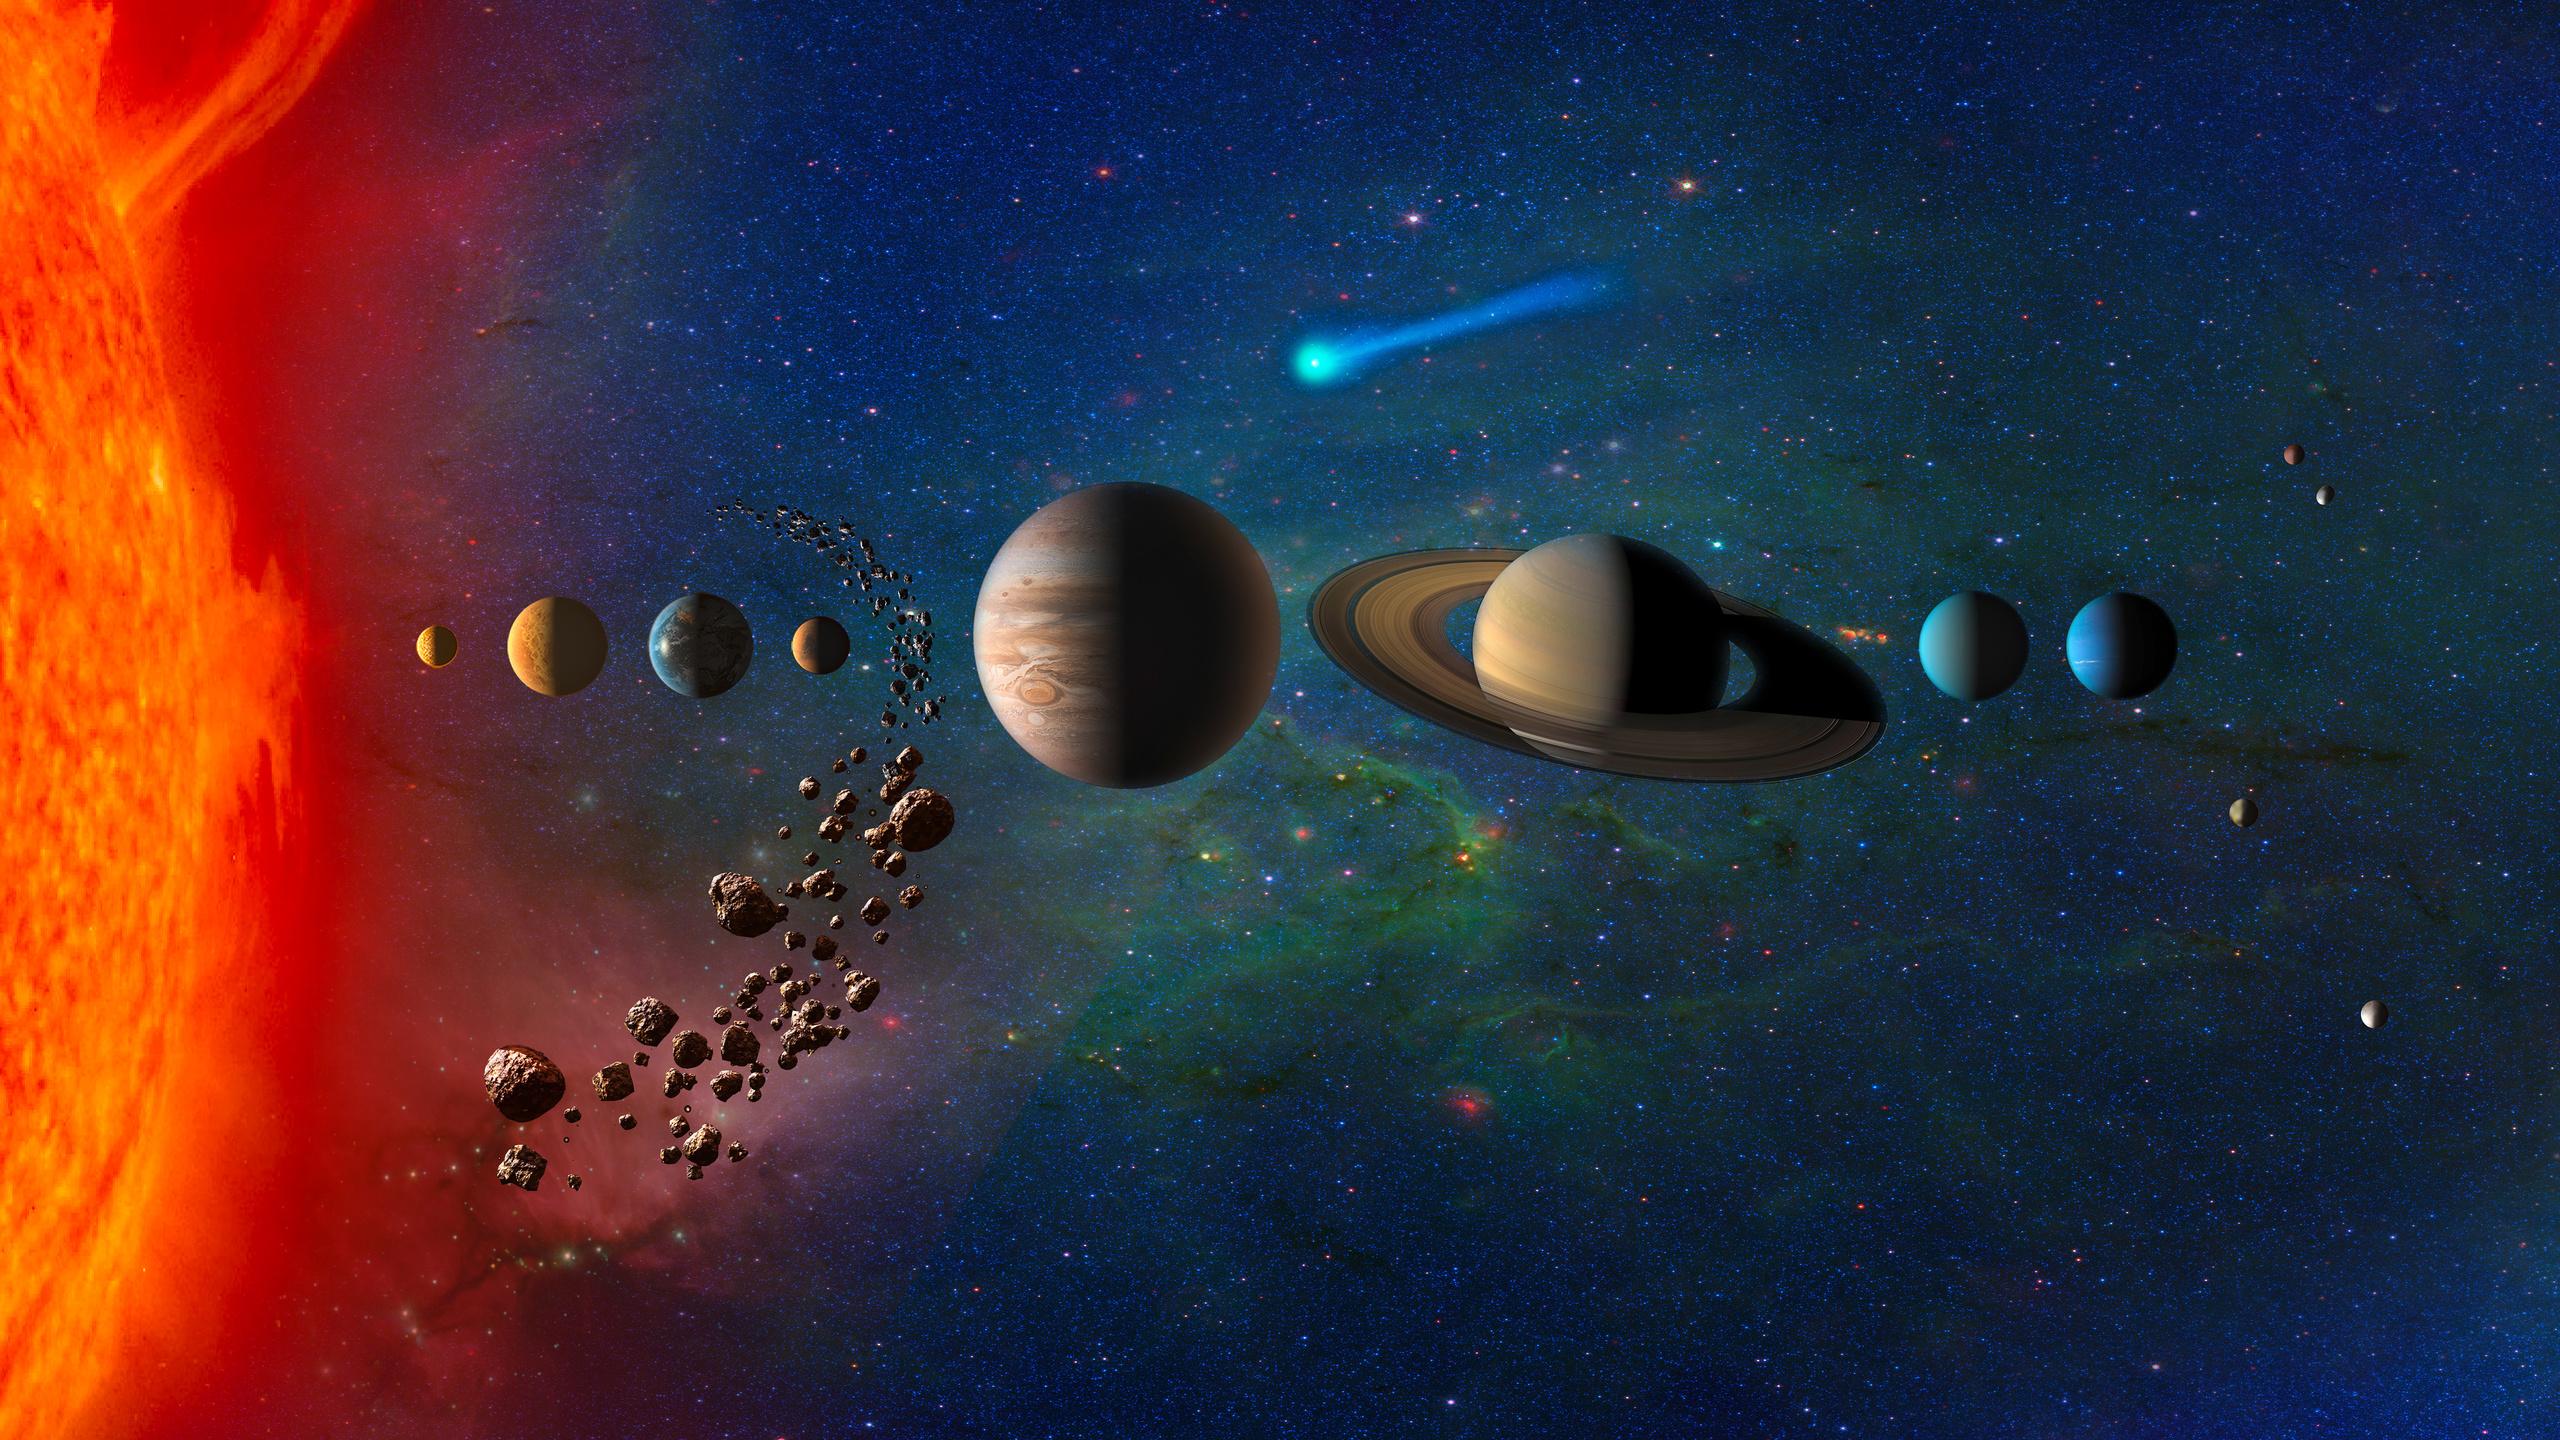 nasa planetary data system - HD2560×1440